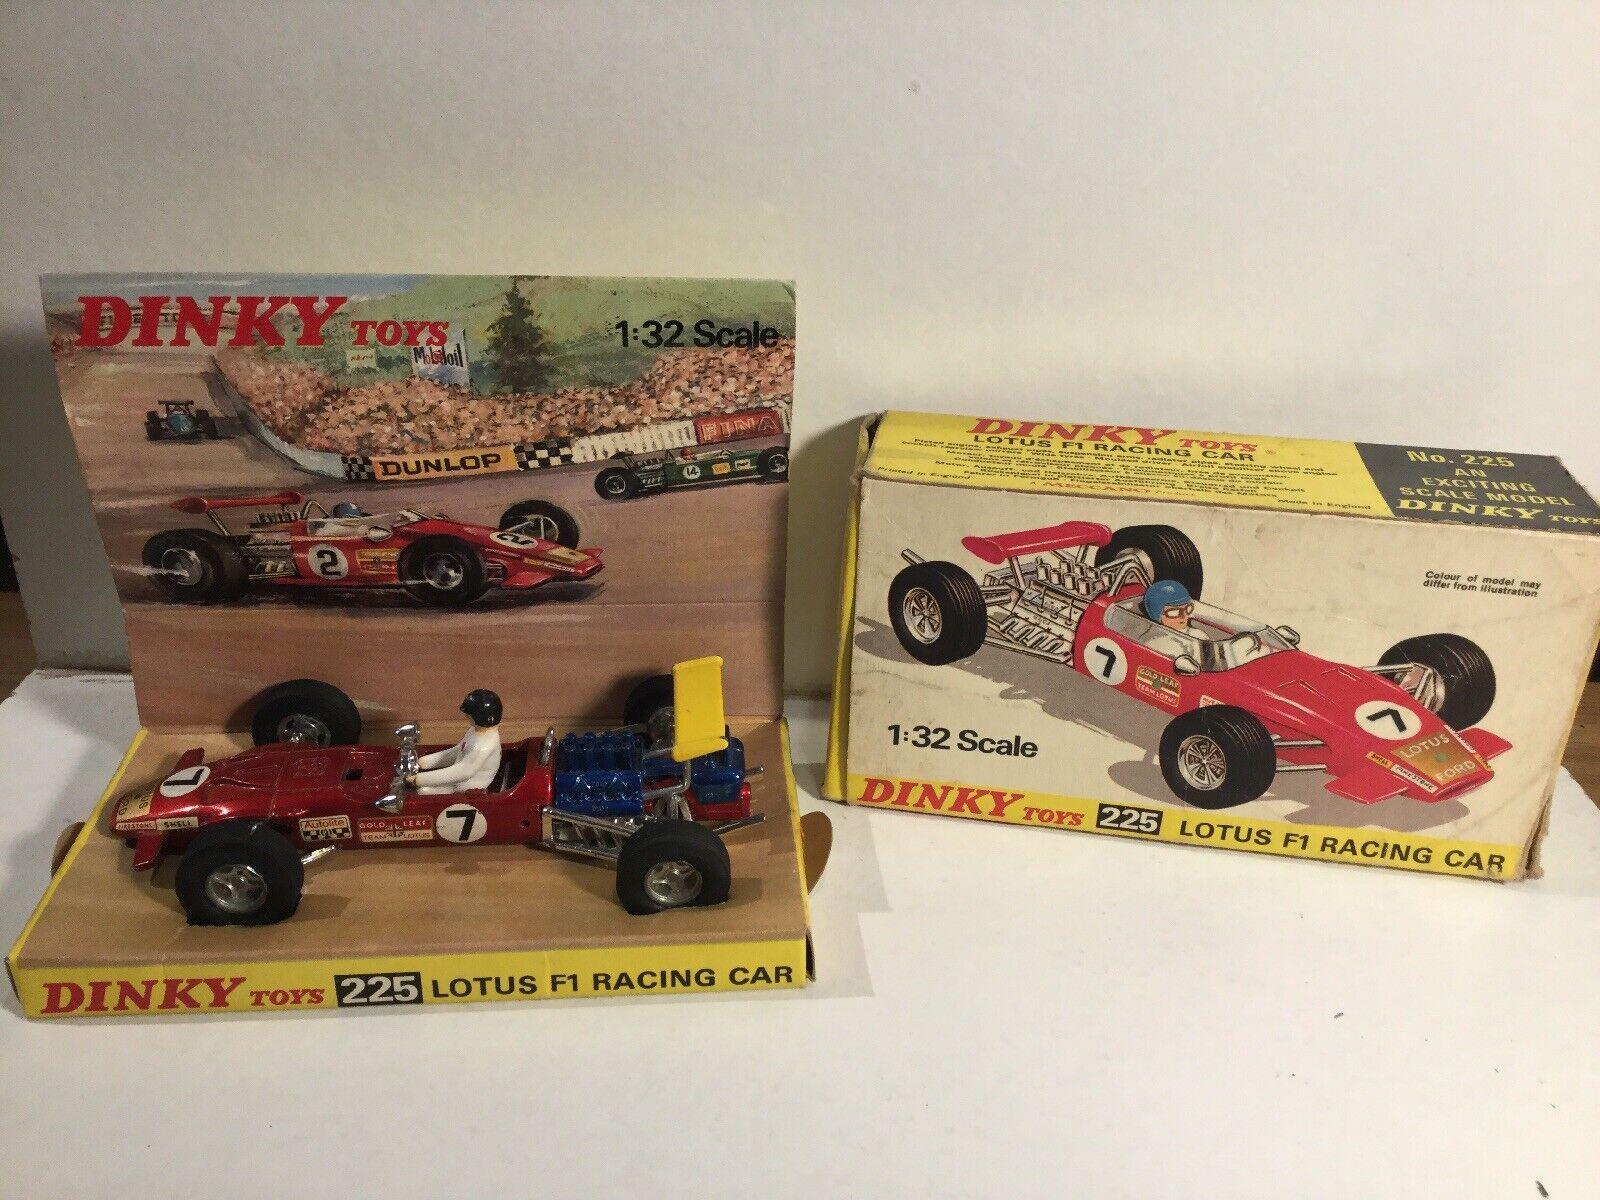 DINKY TOYS 225 Lotus F1 Racing car Formule 1 dans sa boîte d'origine